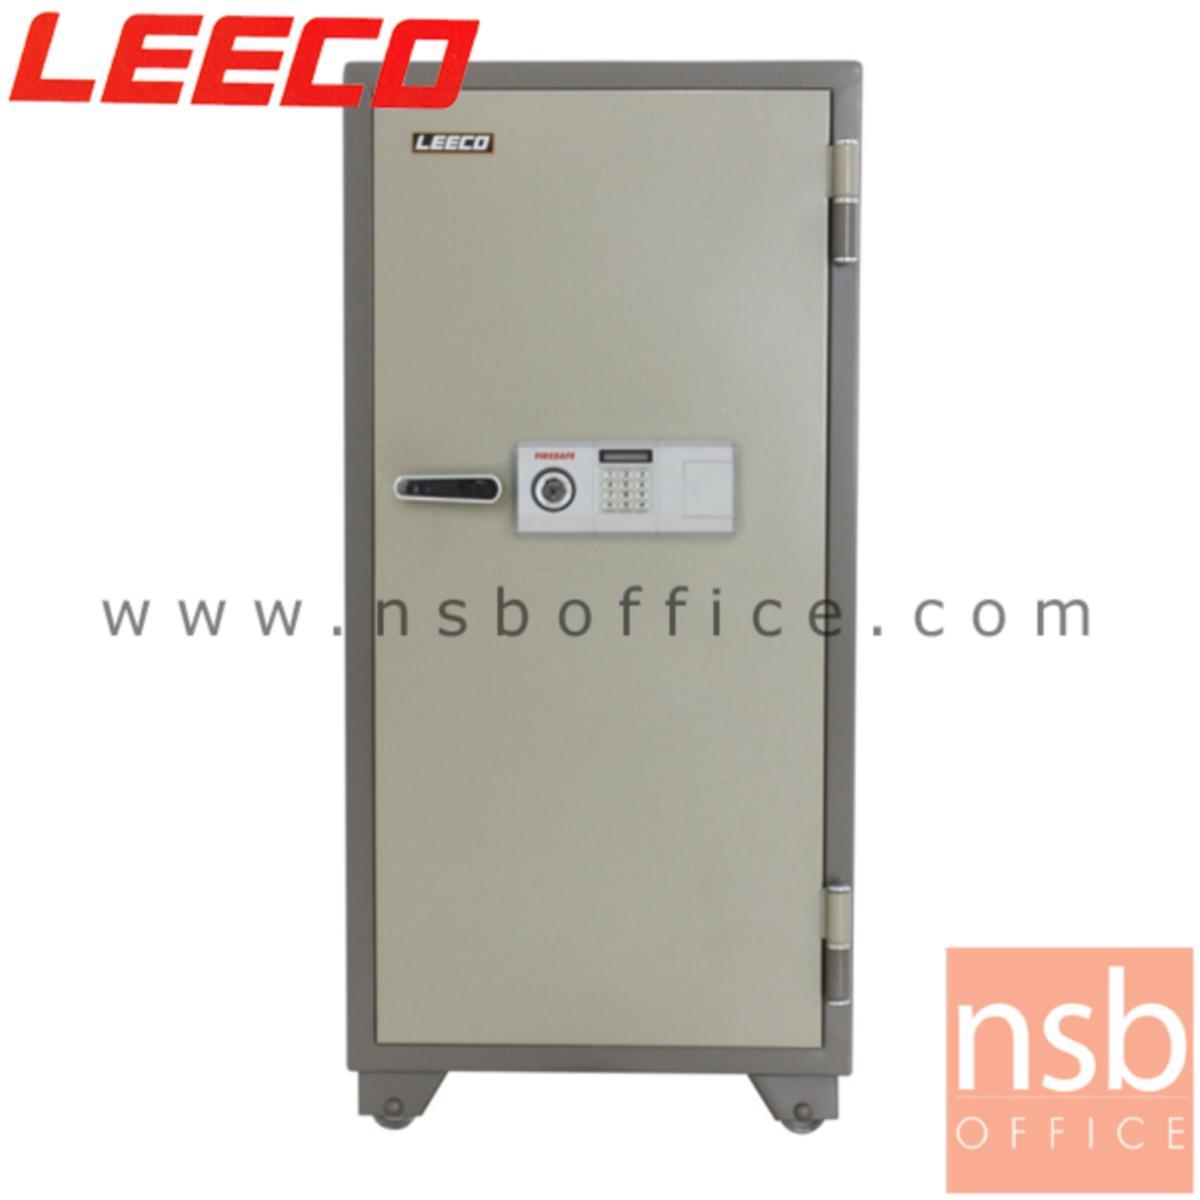 F02A053:ตุ้เซฟดิจิตอล 350 กก. ลีโก้ รุ่น LEECO-703-XPL มี 1 กุญแจ 1 รหัส